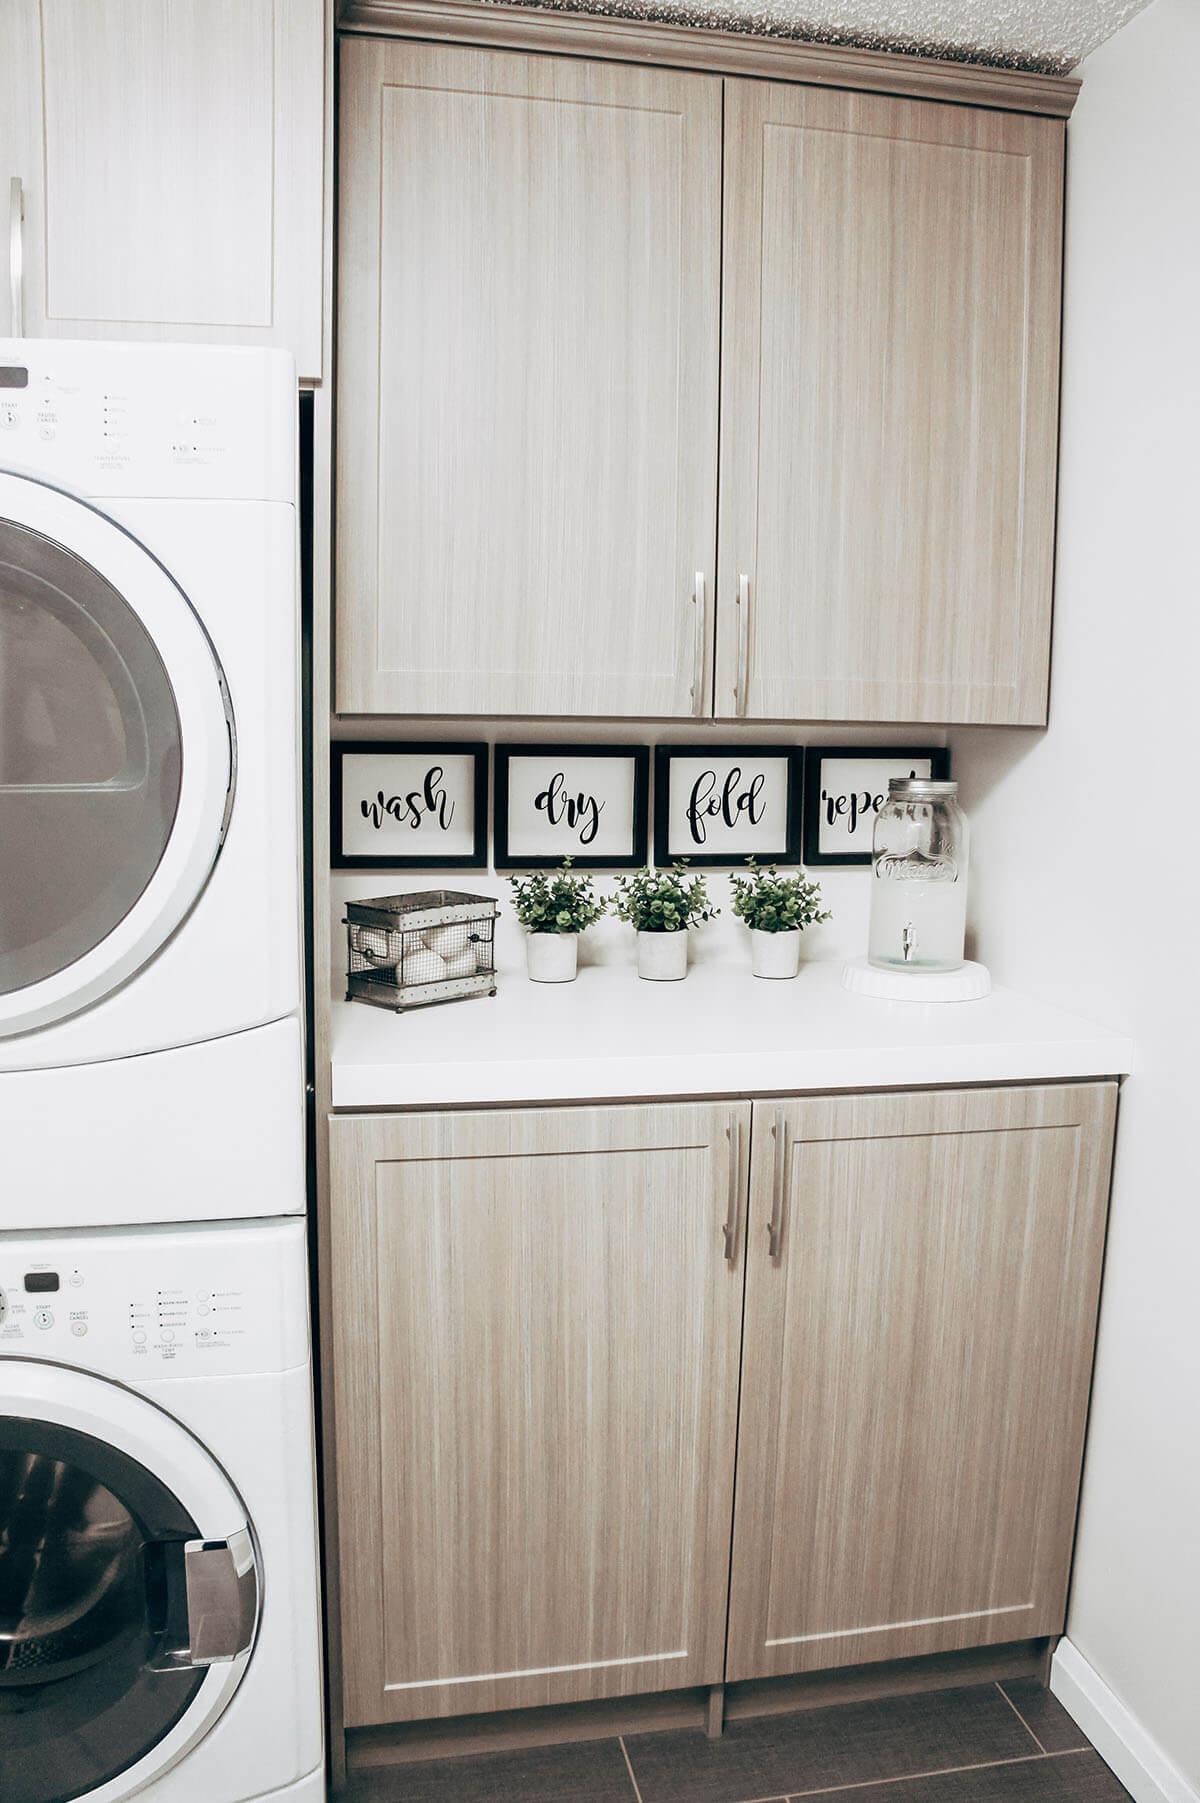 DIY Laundry Room Sign Decor